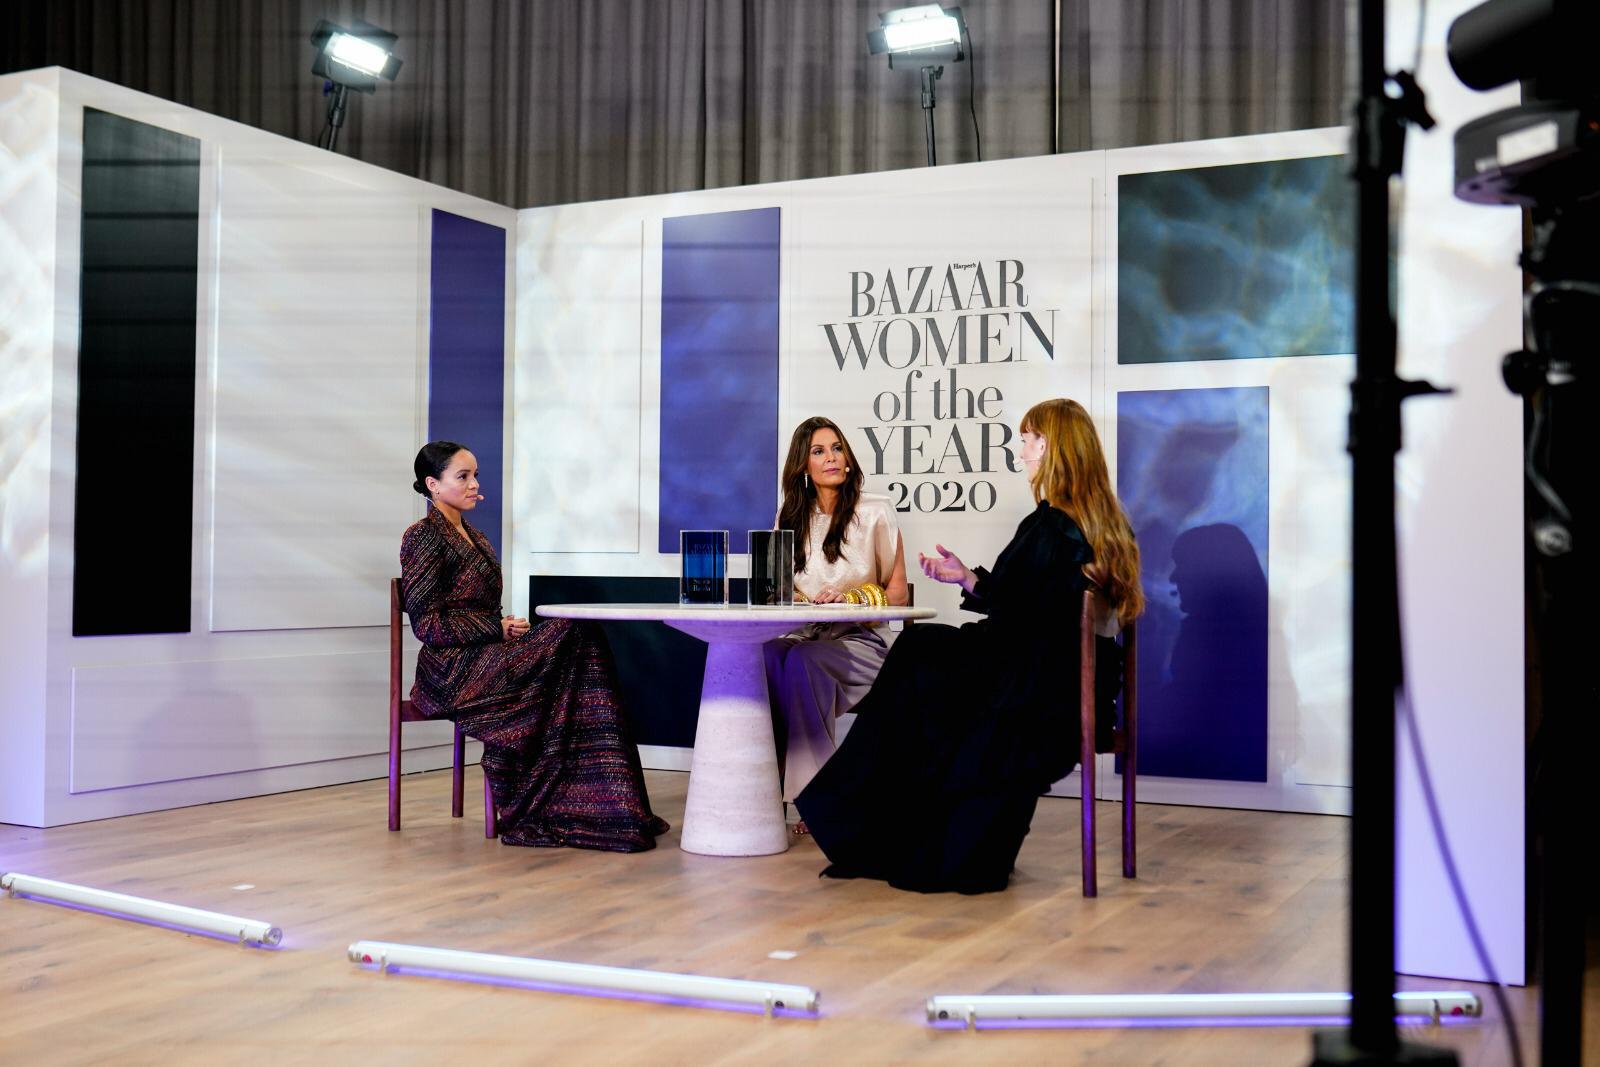 Samira Rafaela volgens Harper's Bazaar 'International Woman of the Year'